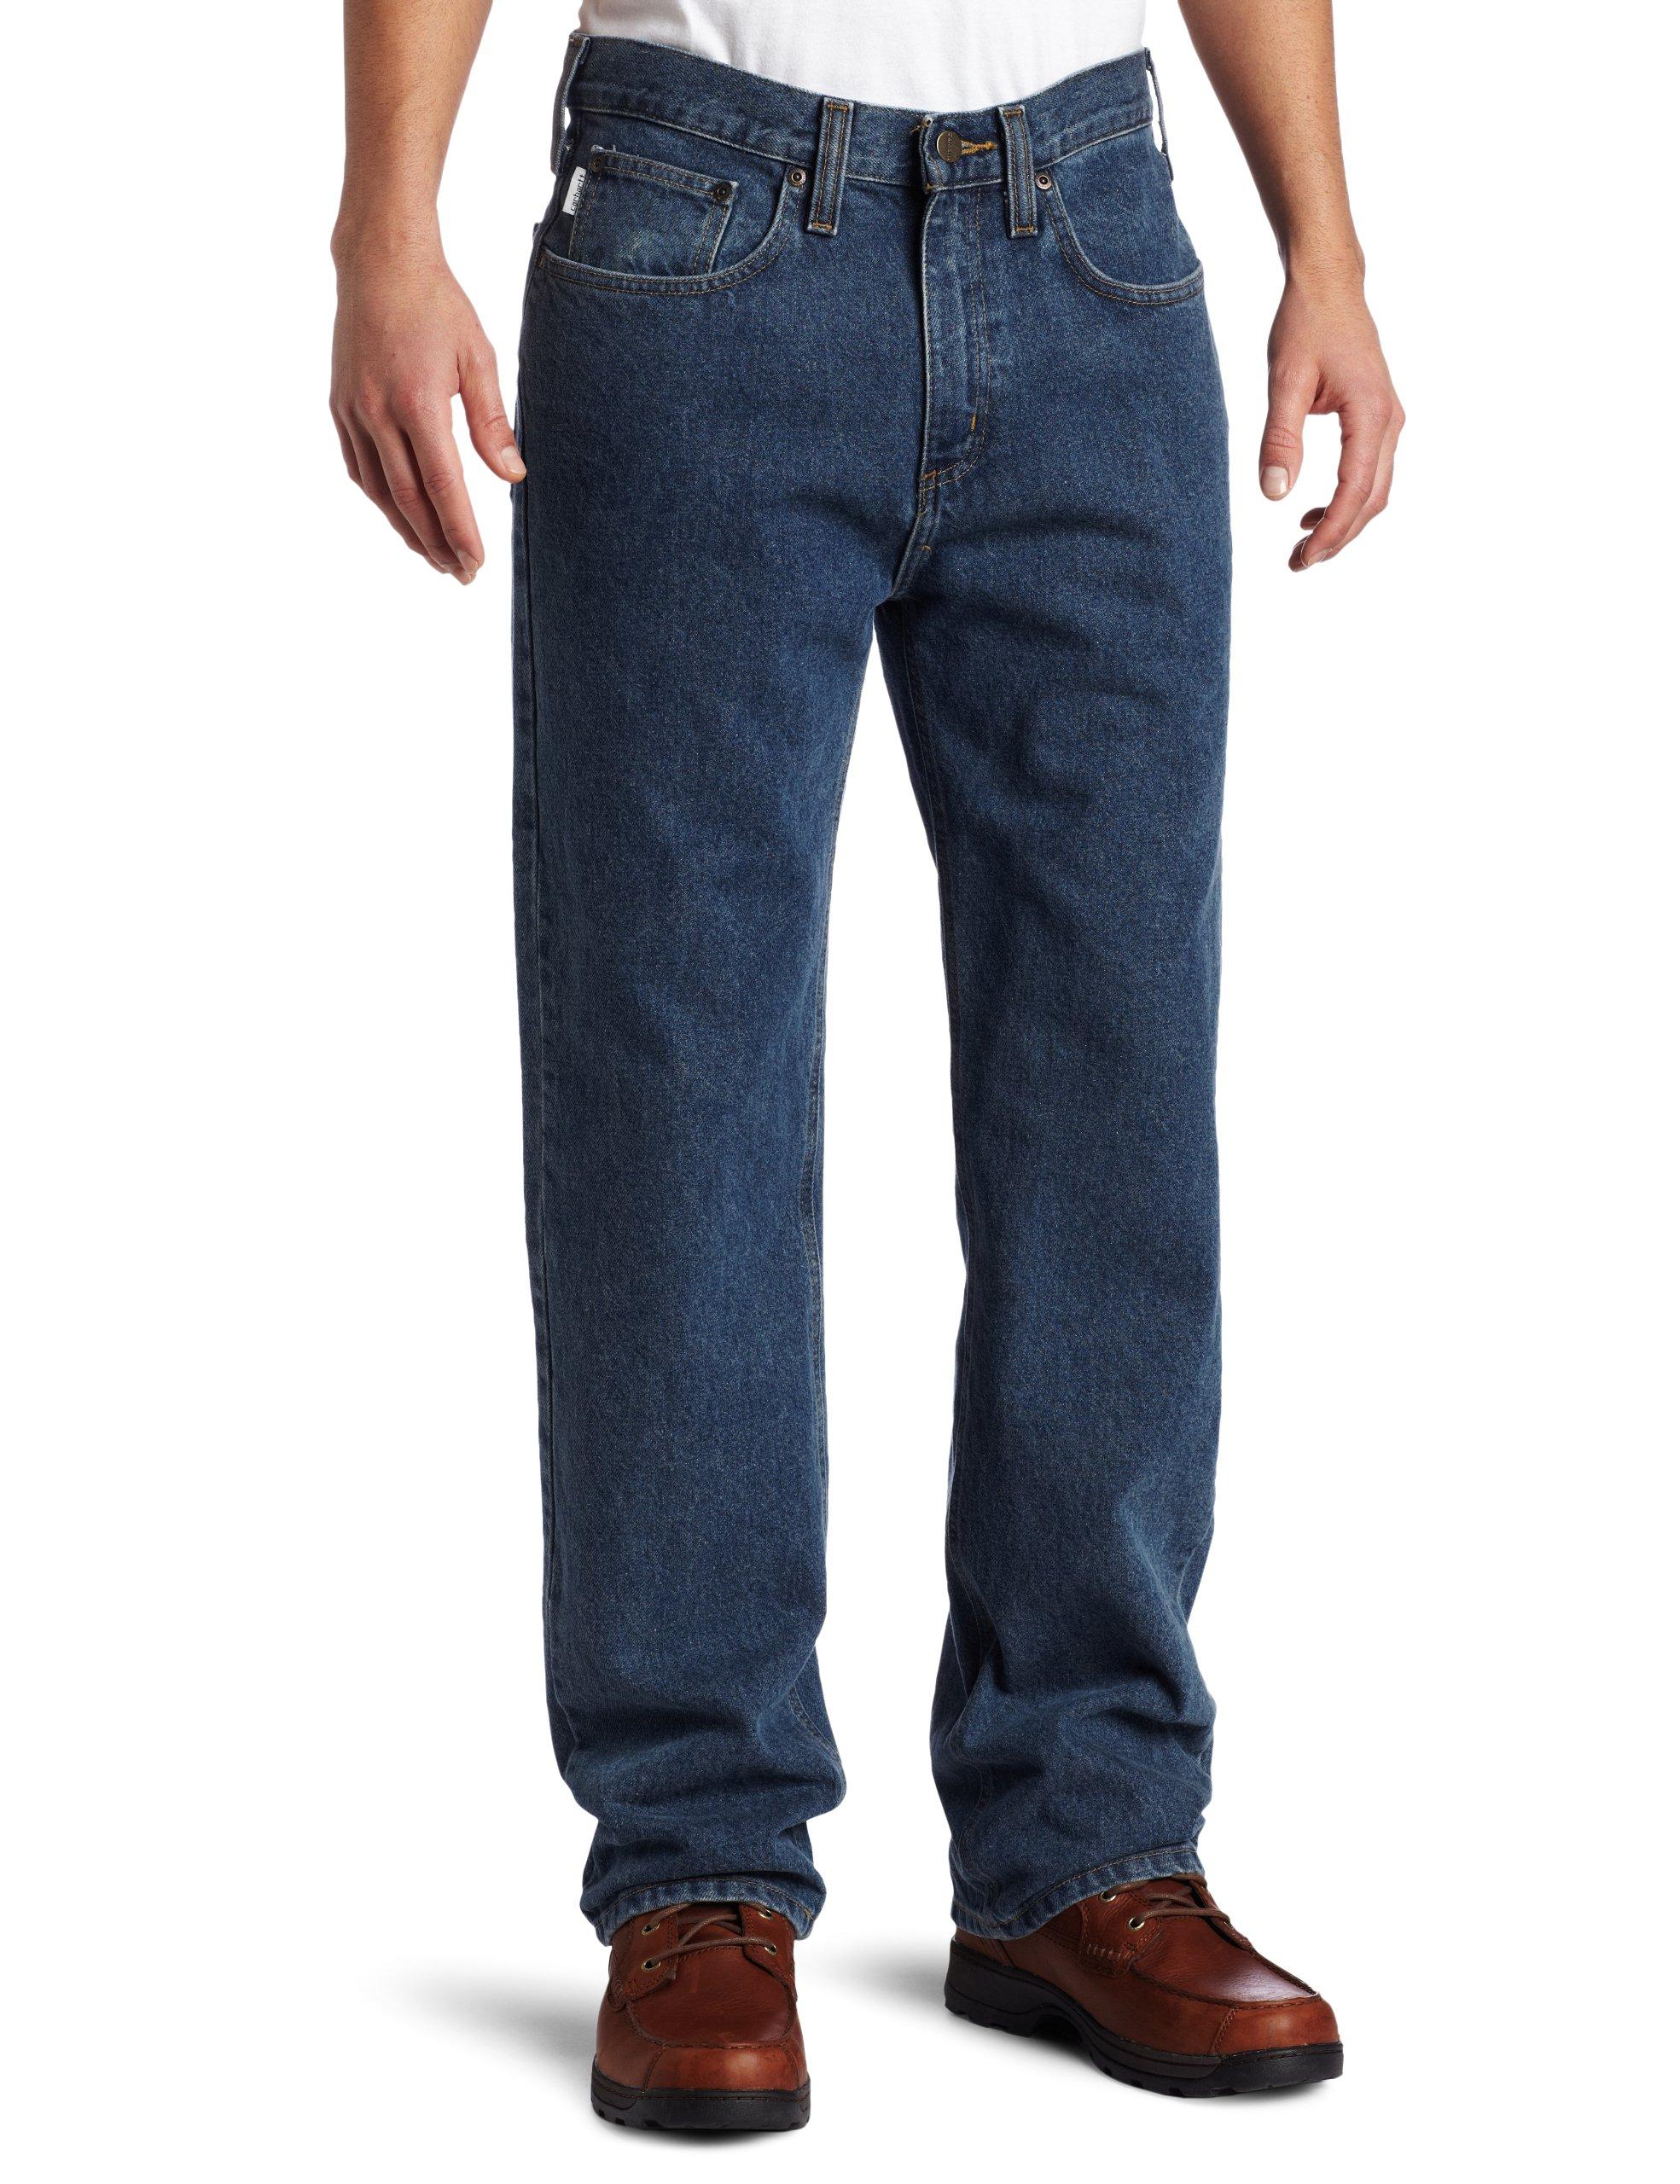 Carhartt Men's Relaxed Straight Denim Five Pocket Jean,Deepstone,34 x 32